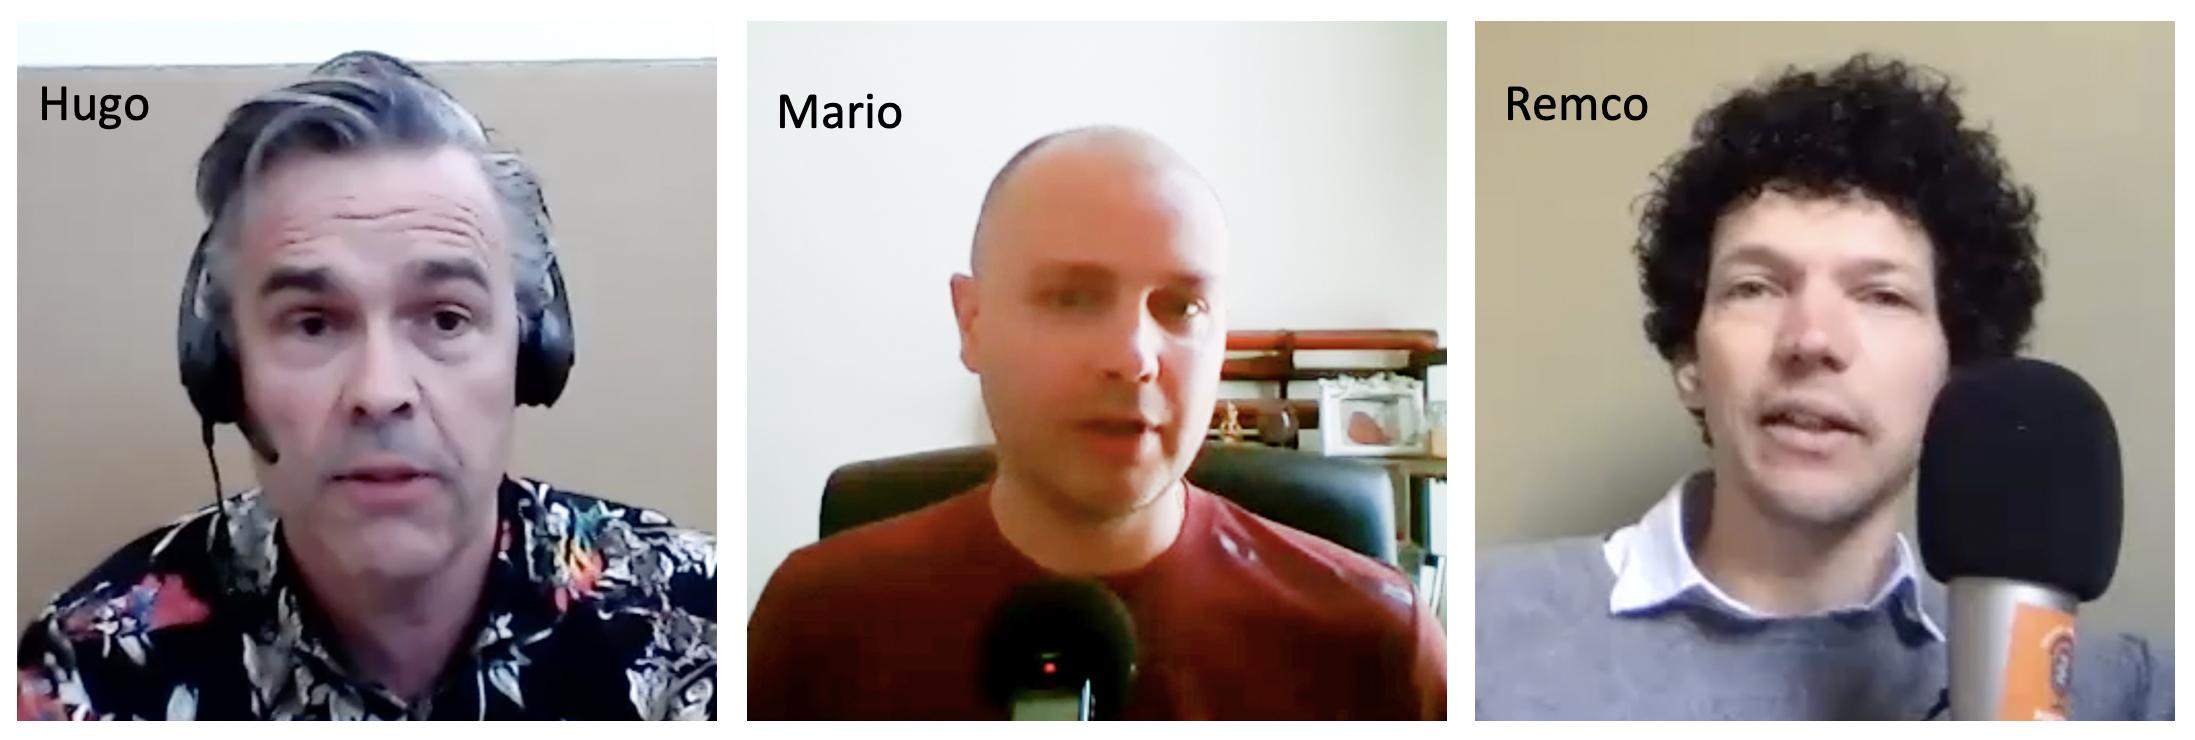 Hugo-Mario-Remco